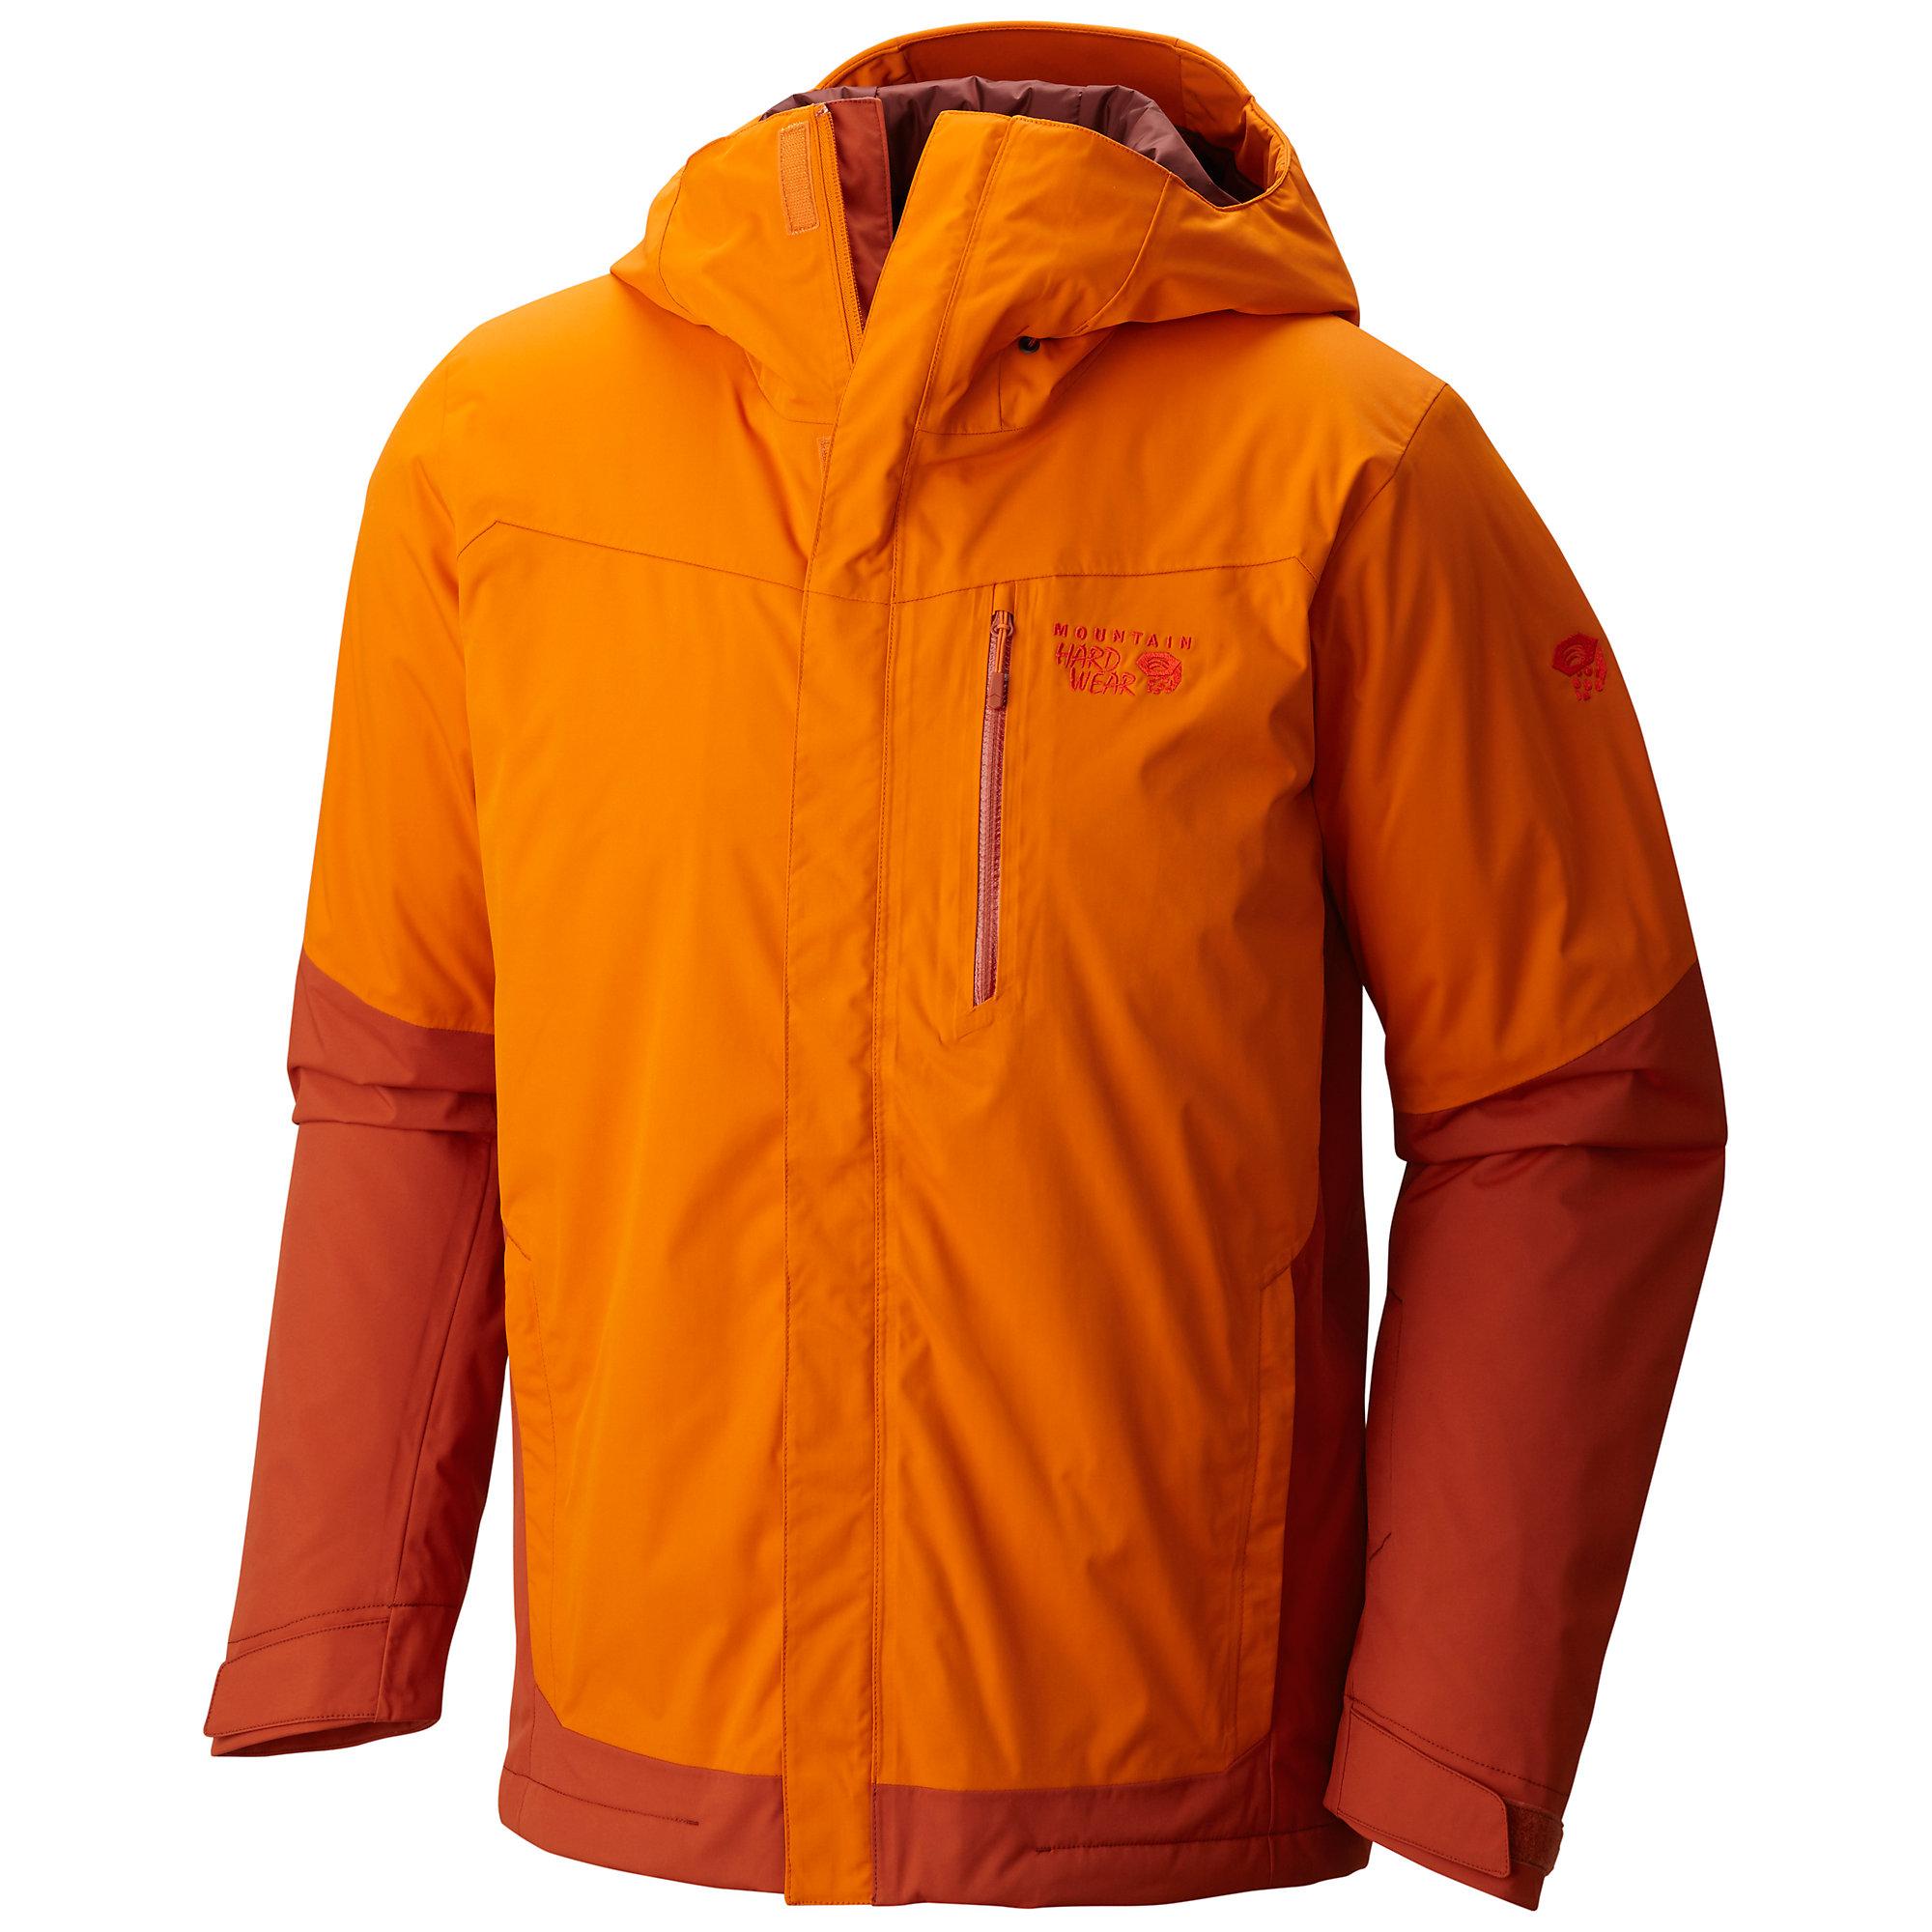 Mountain Hardwear Dragon's Back Insulated Jacket